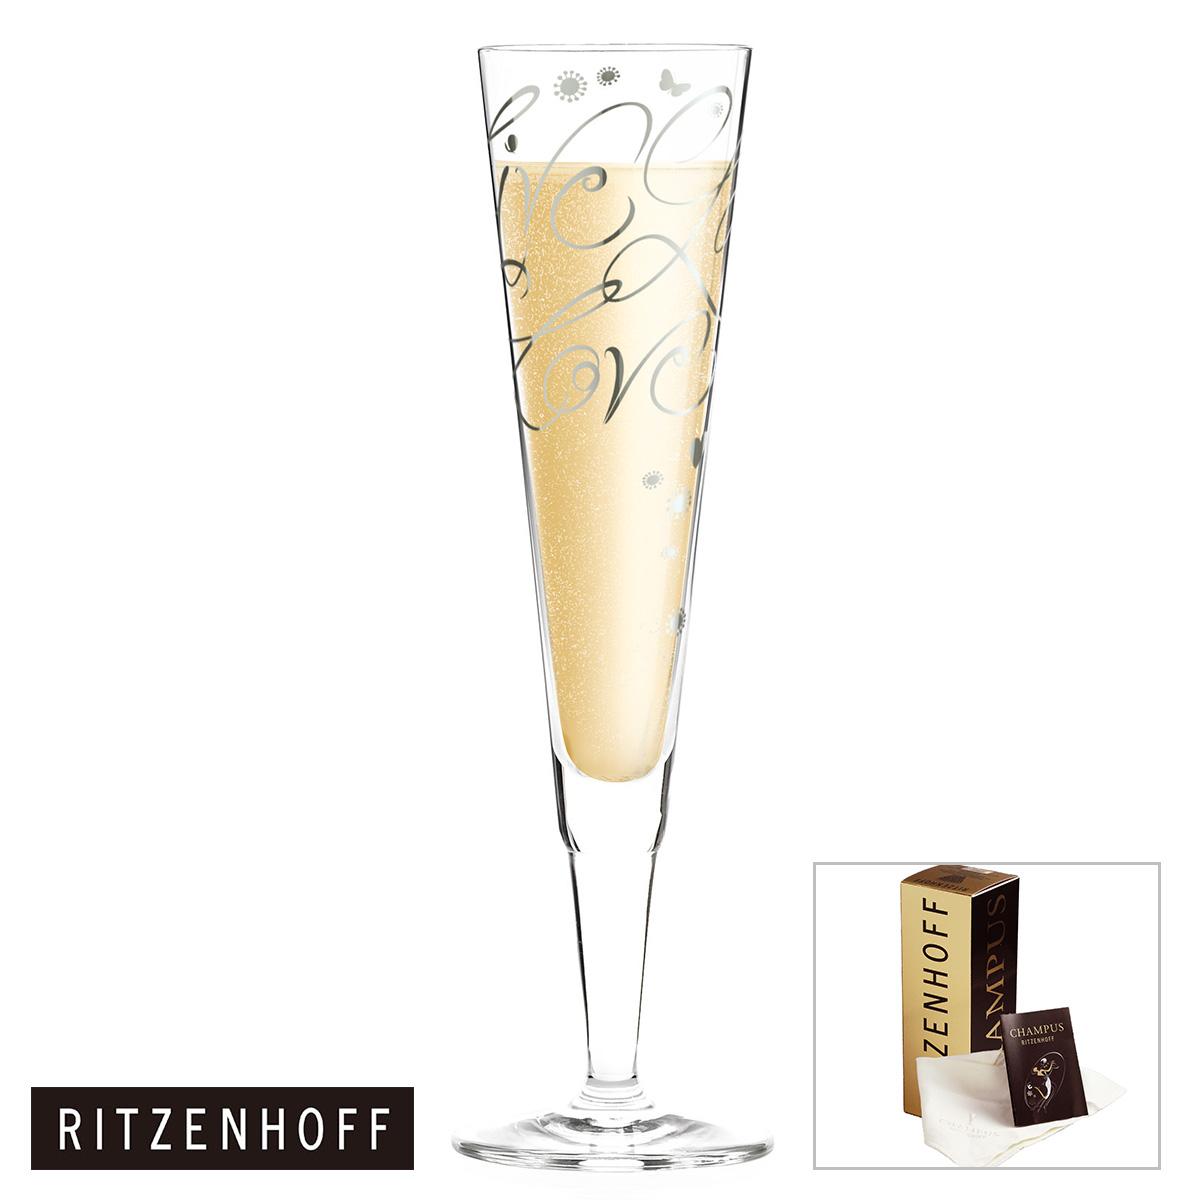 RITZENHOFF CHAMPUS COLLECTION Beautifulness Pass Collection Annett Wurm 81070198 Champagne Glass